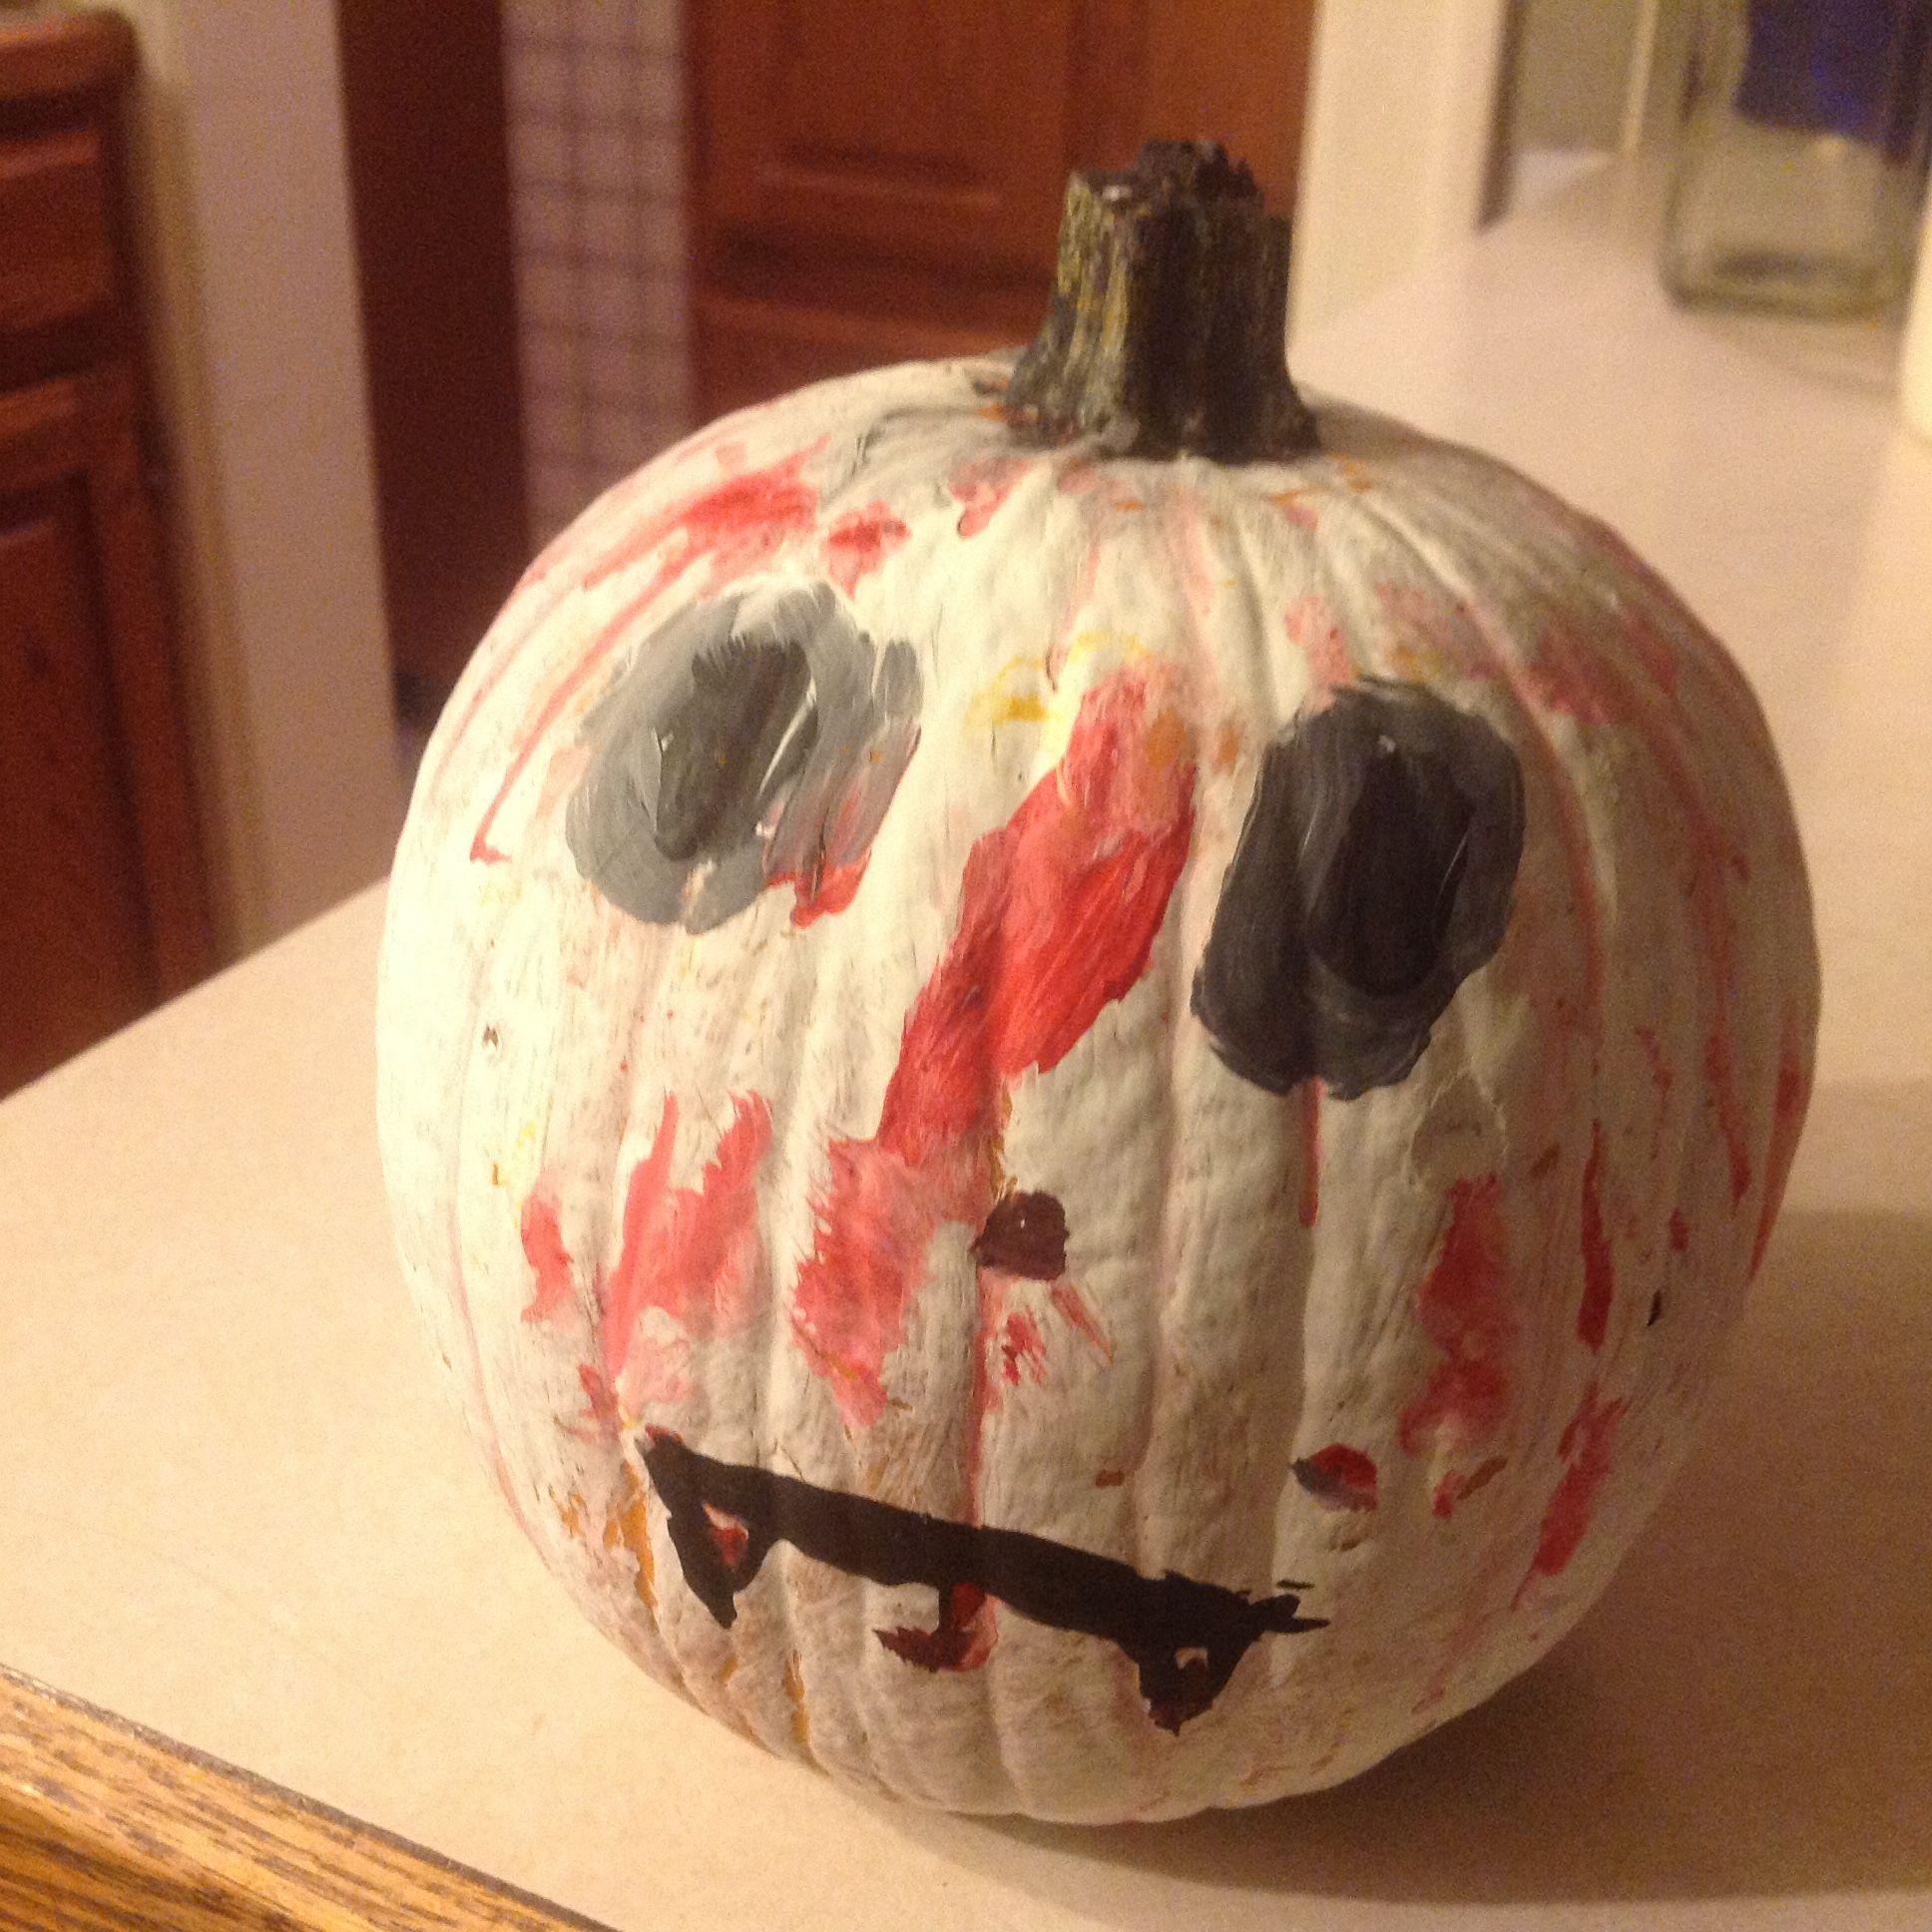 Emma's  painted pumpkin idea